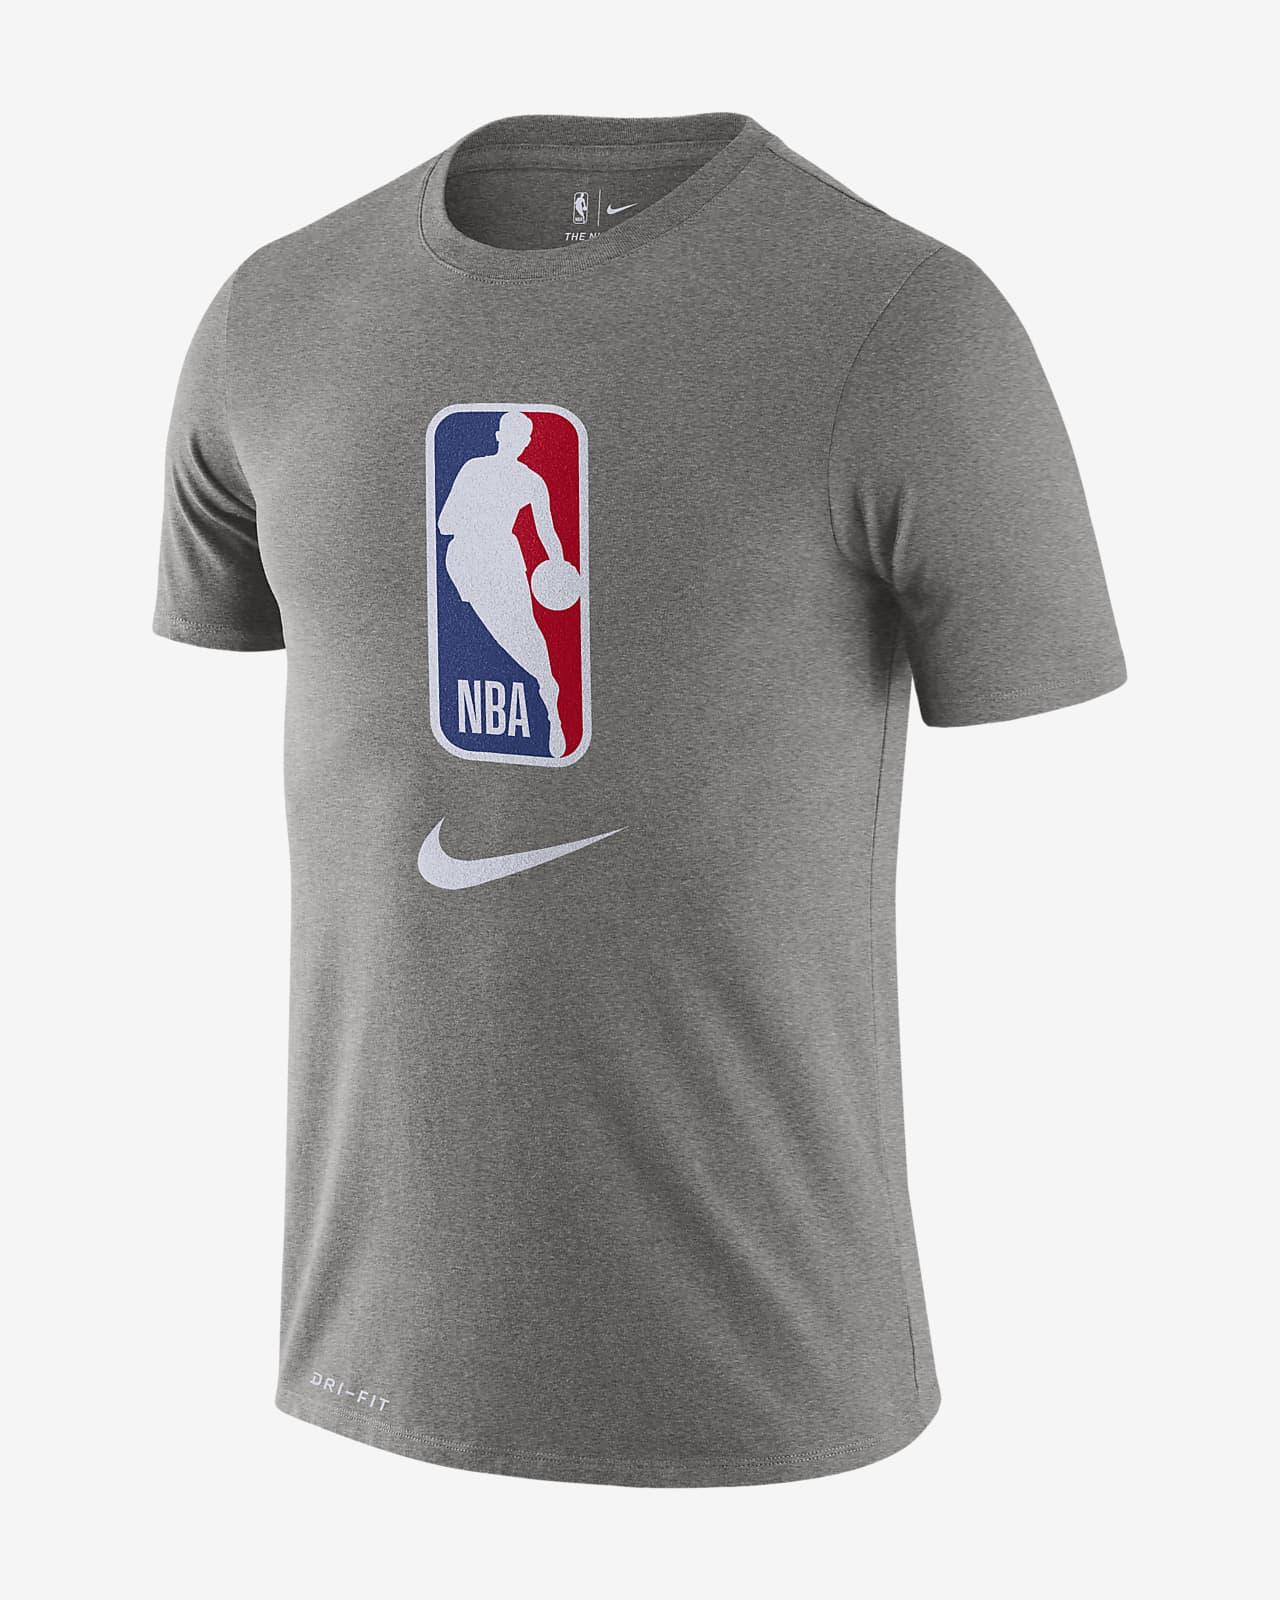 Team 31 Men's Nike Dri-FIT NBA T-Shirt